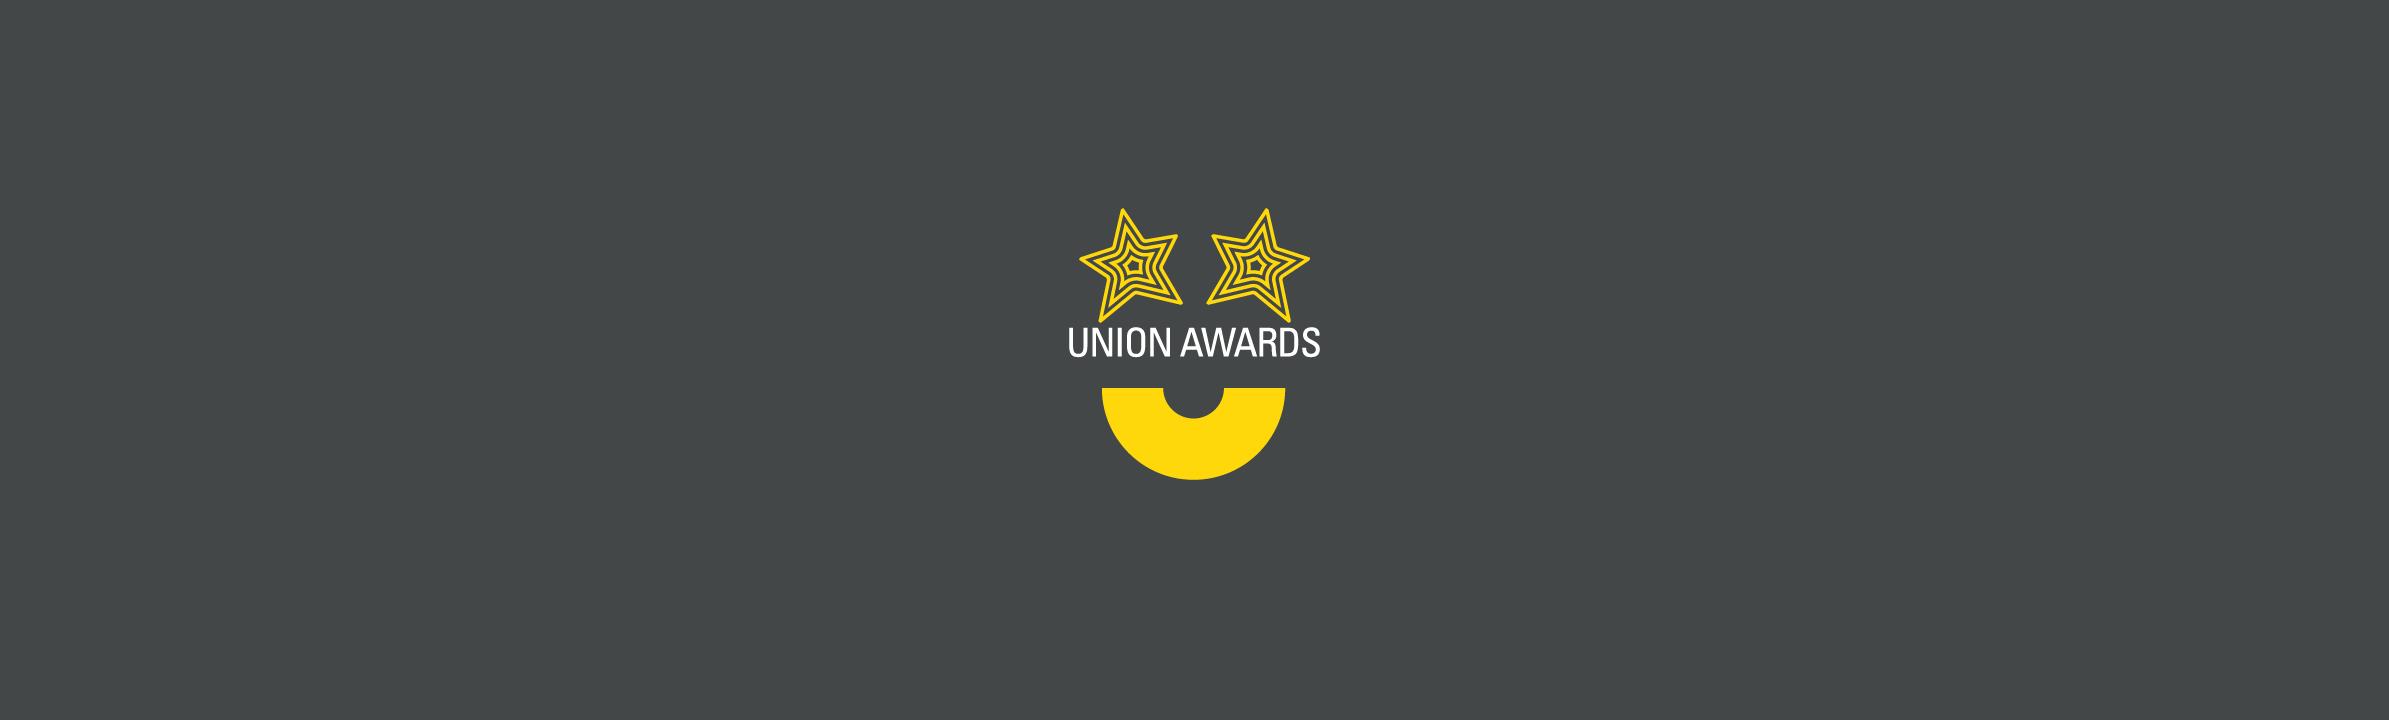 Union awards web banner